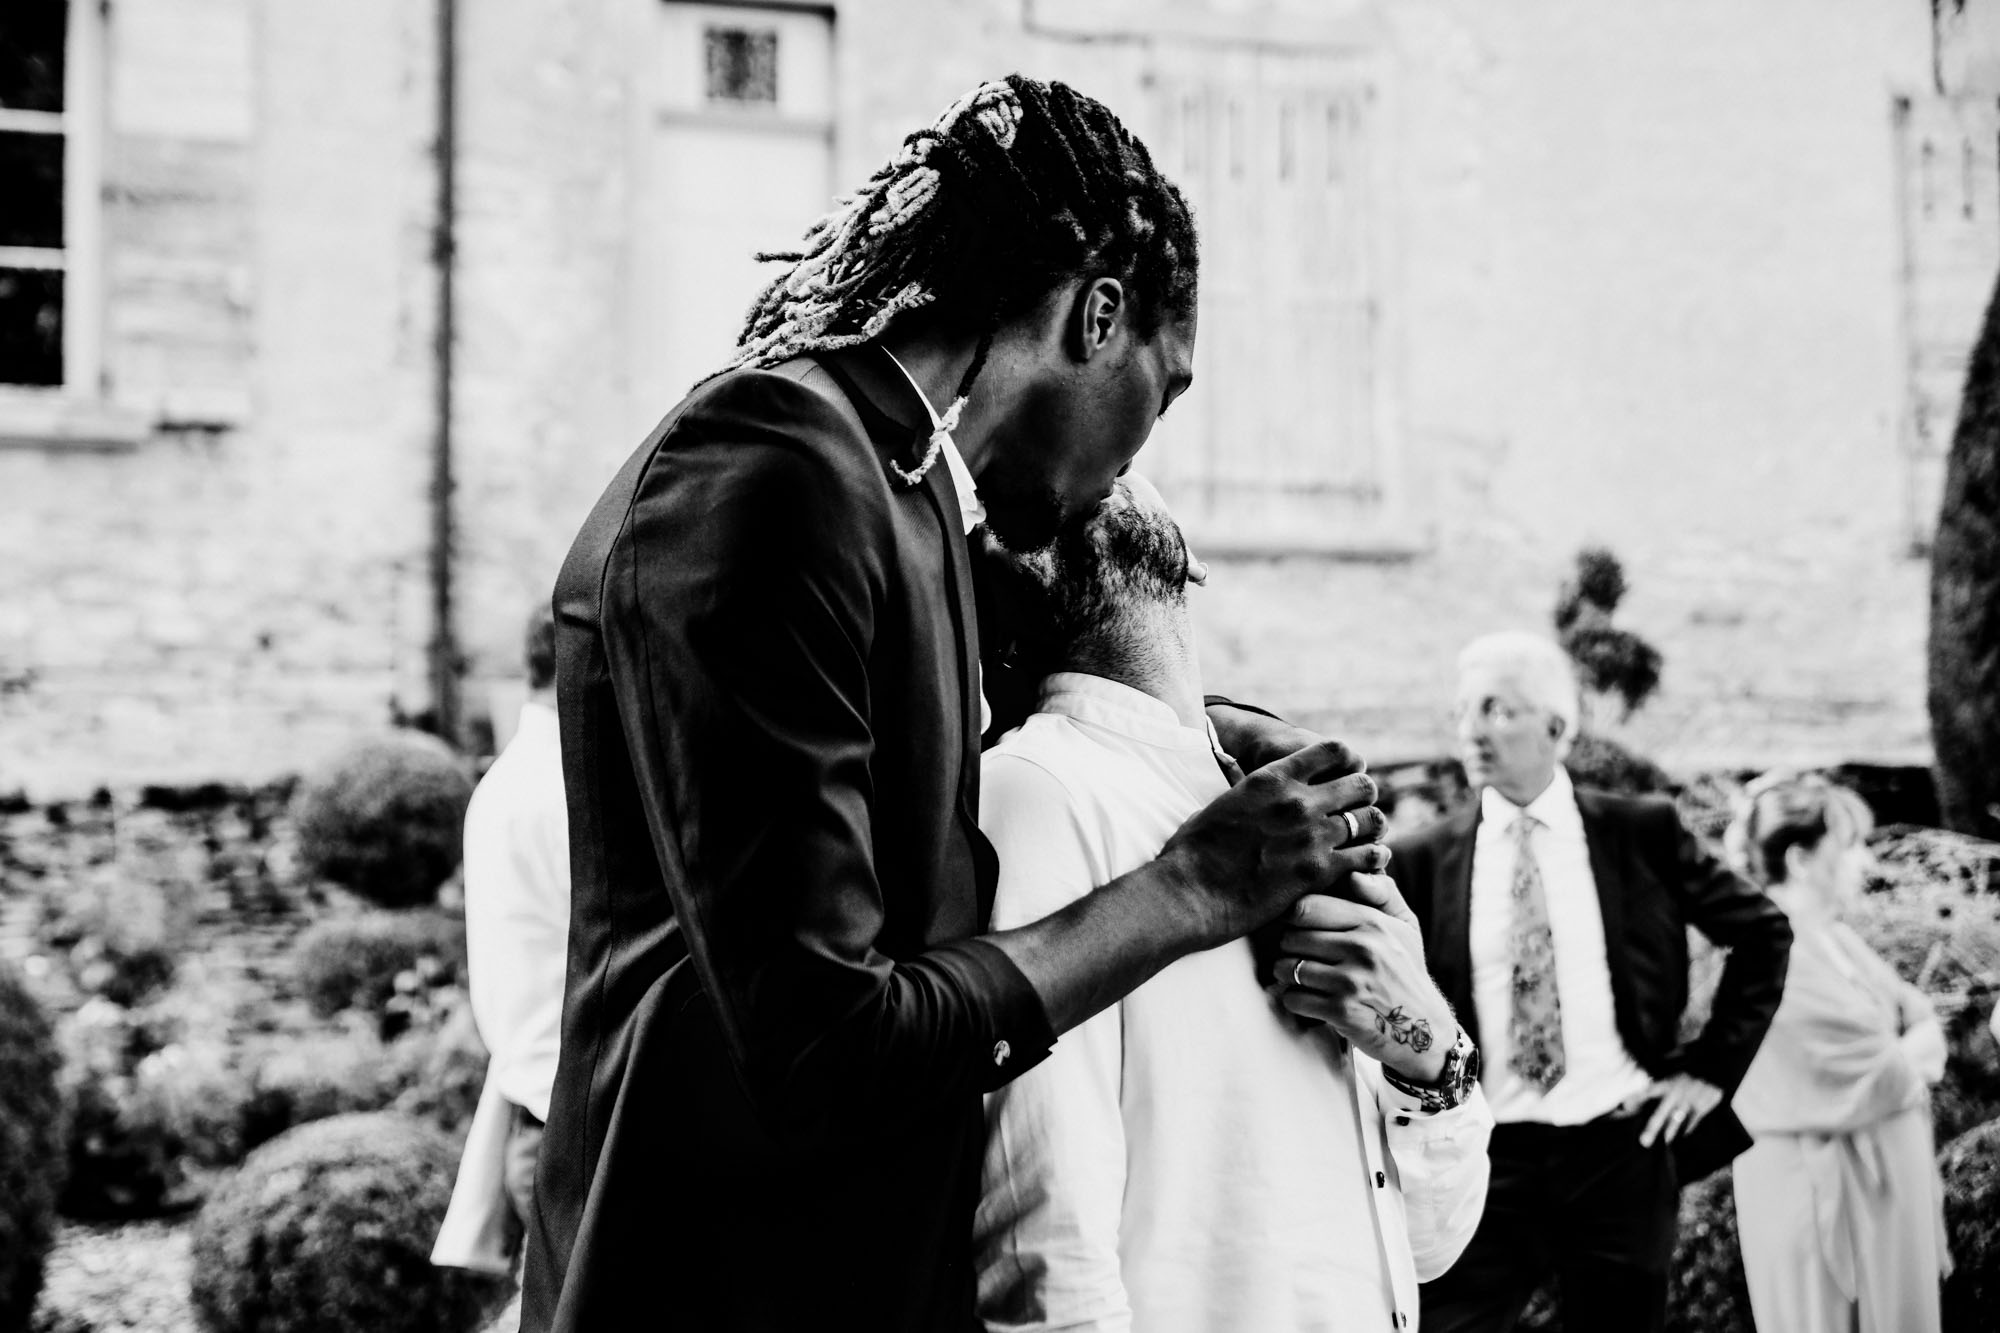 2018-07-21 - LD8_0656 - photographe mariage lyon - laurie diaz - www.lauriediazweeding.com.jpg